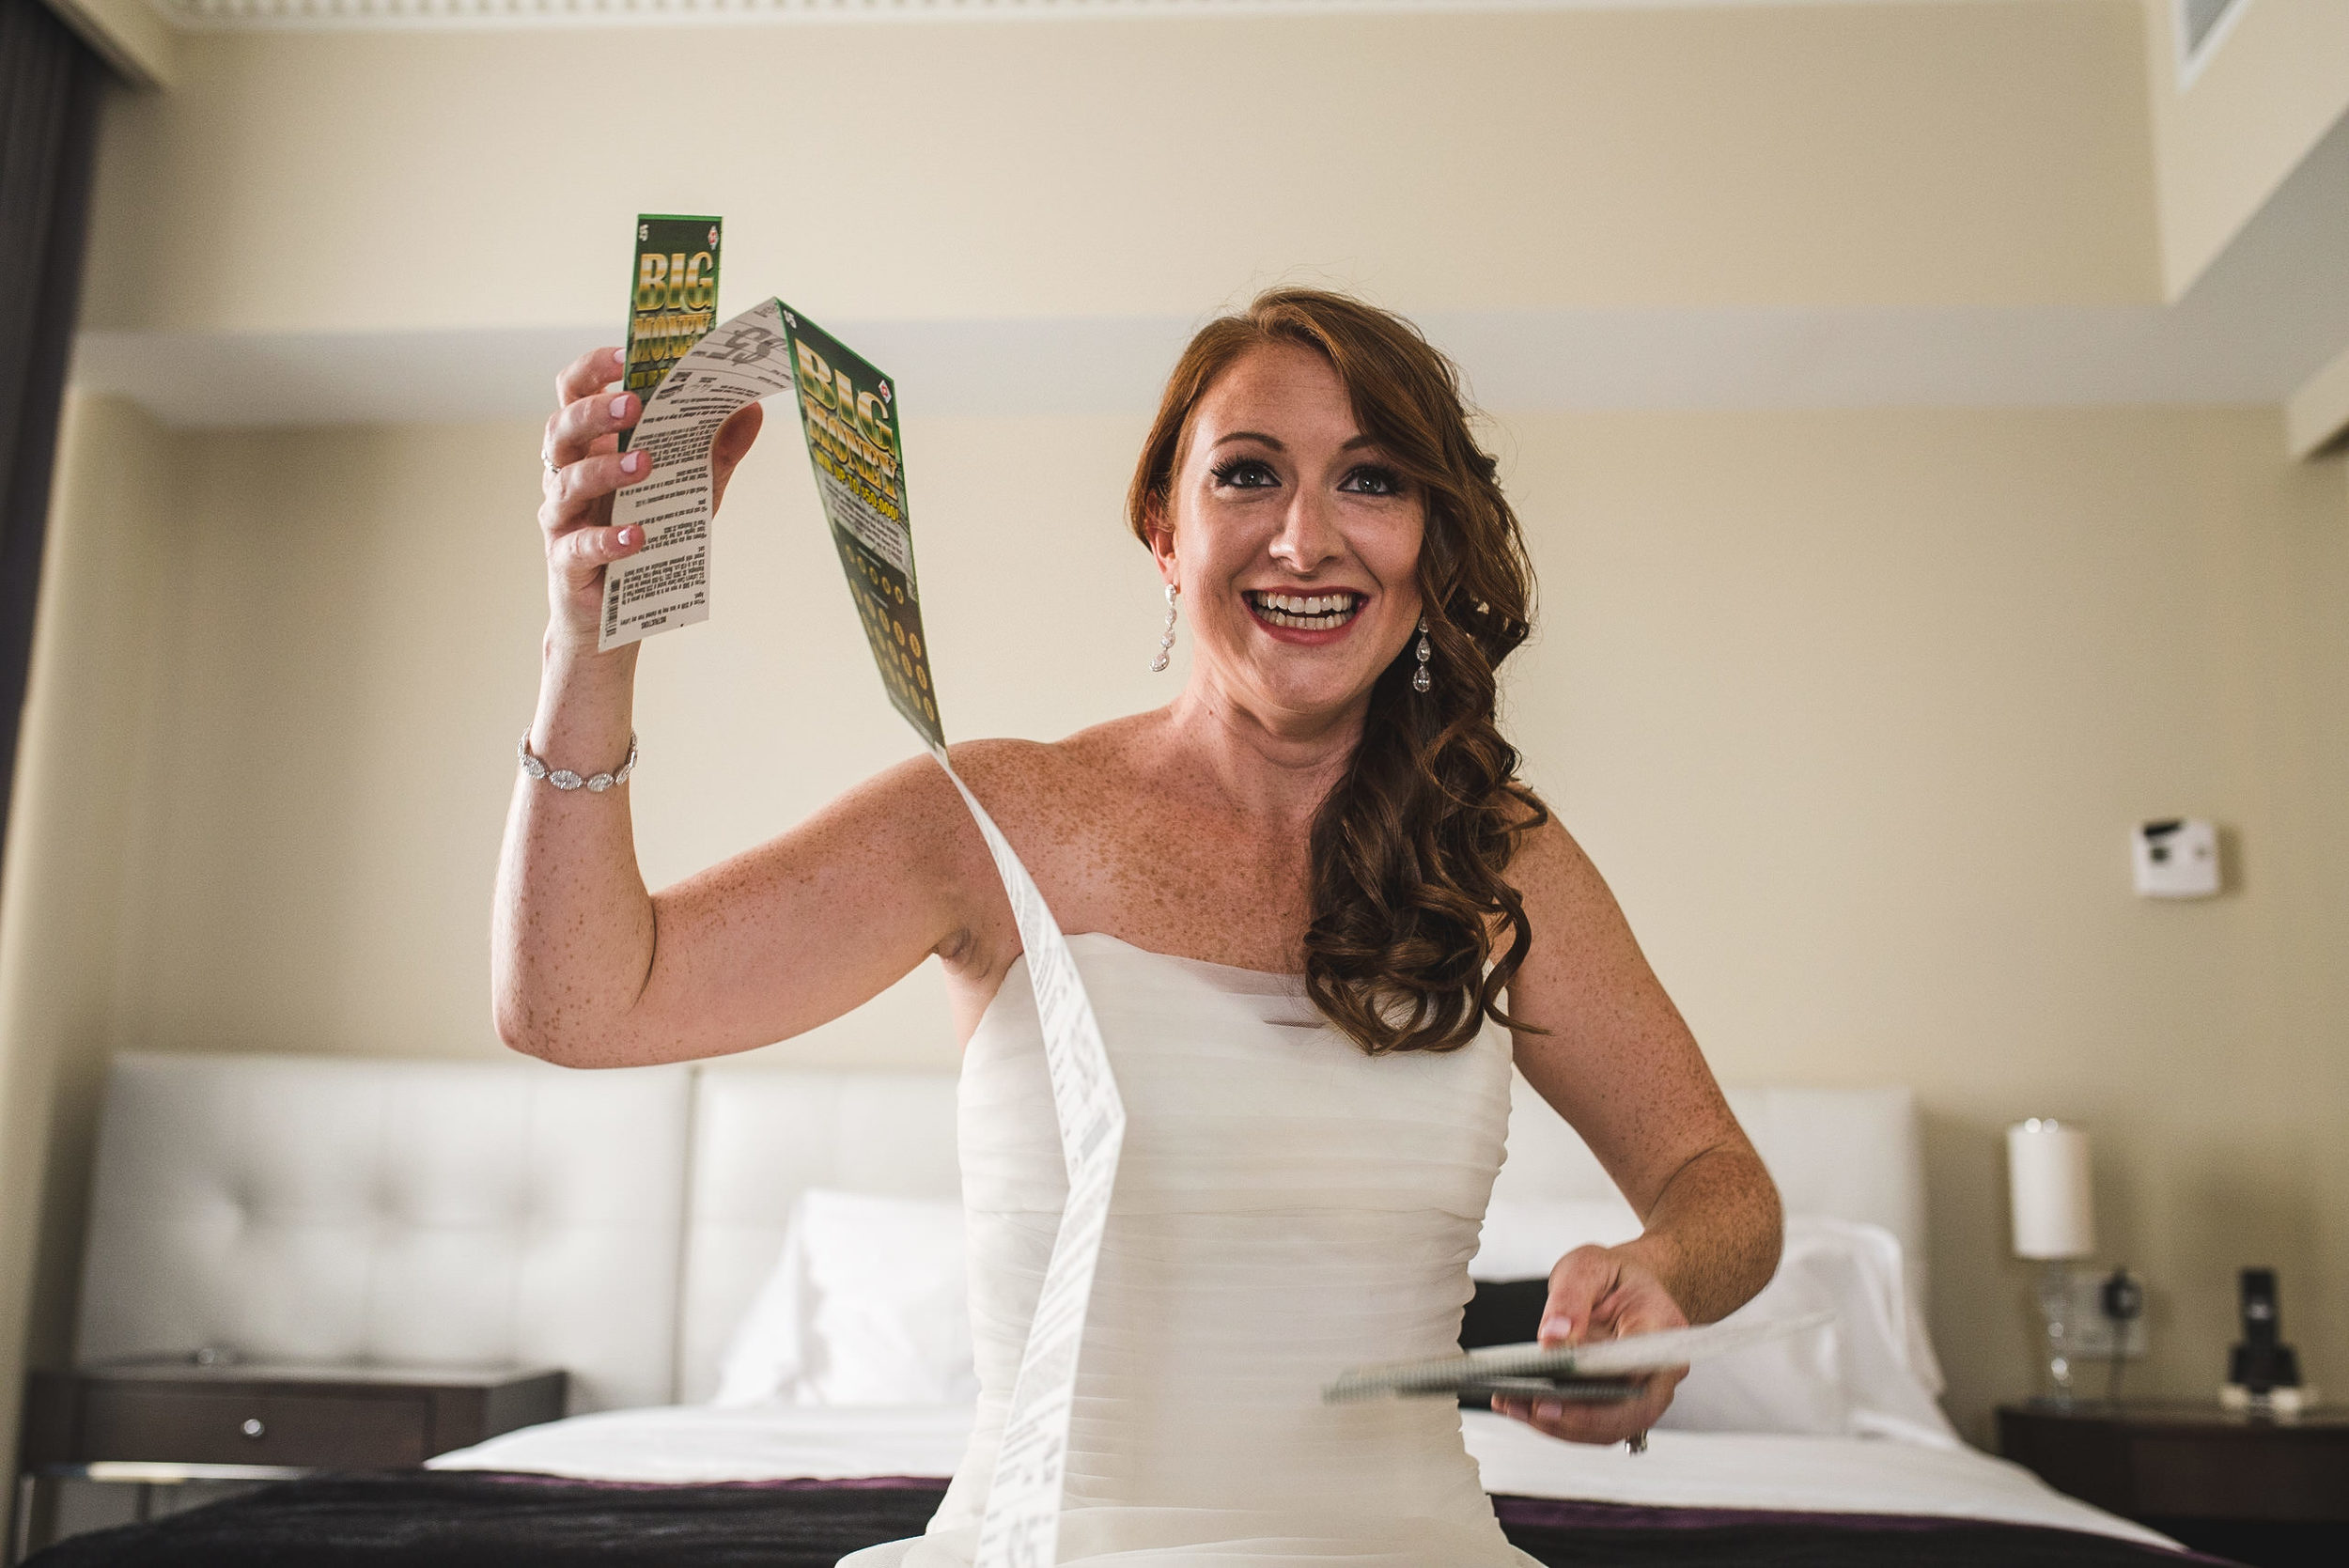 Wedding at W Hotel Washington DC by Mantas Kubilinskas-6.jpg